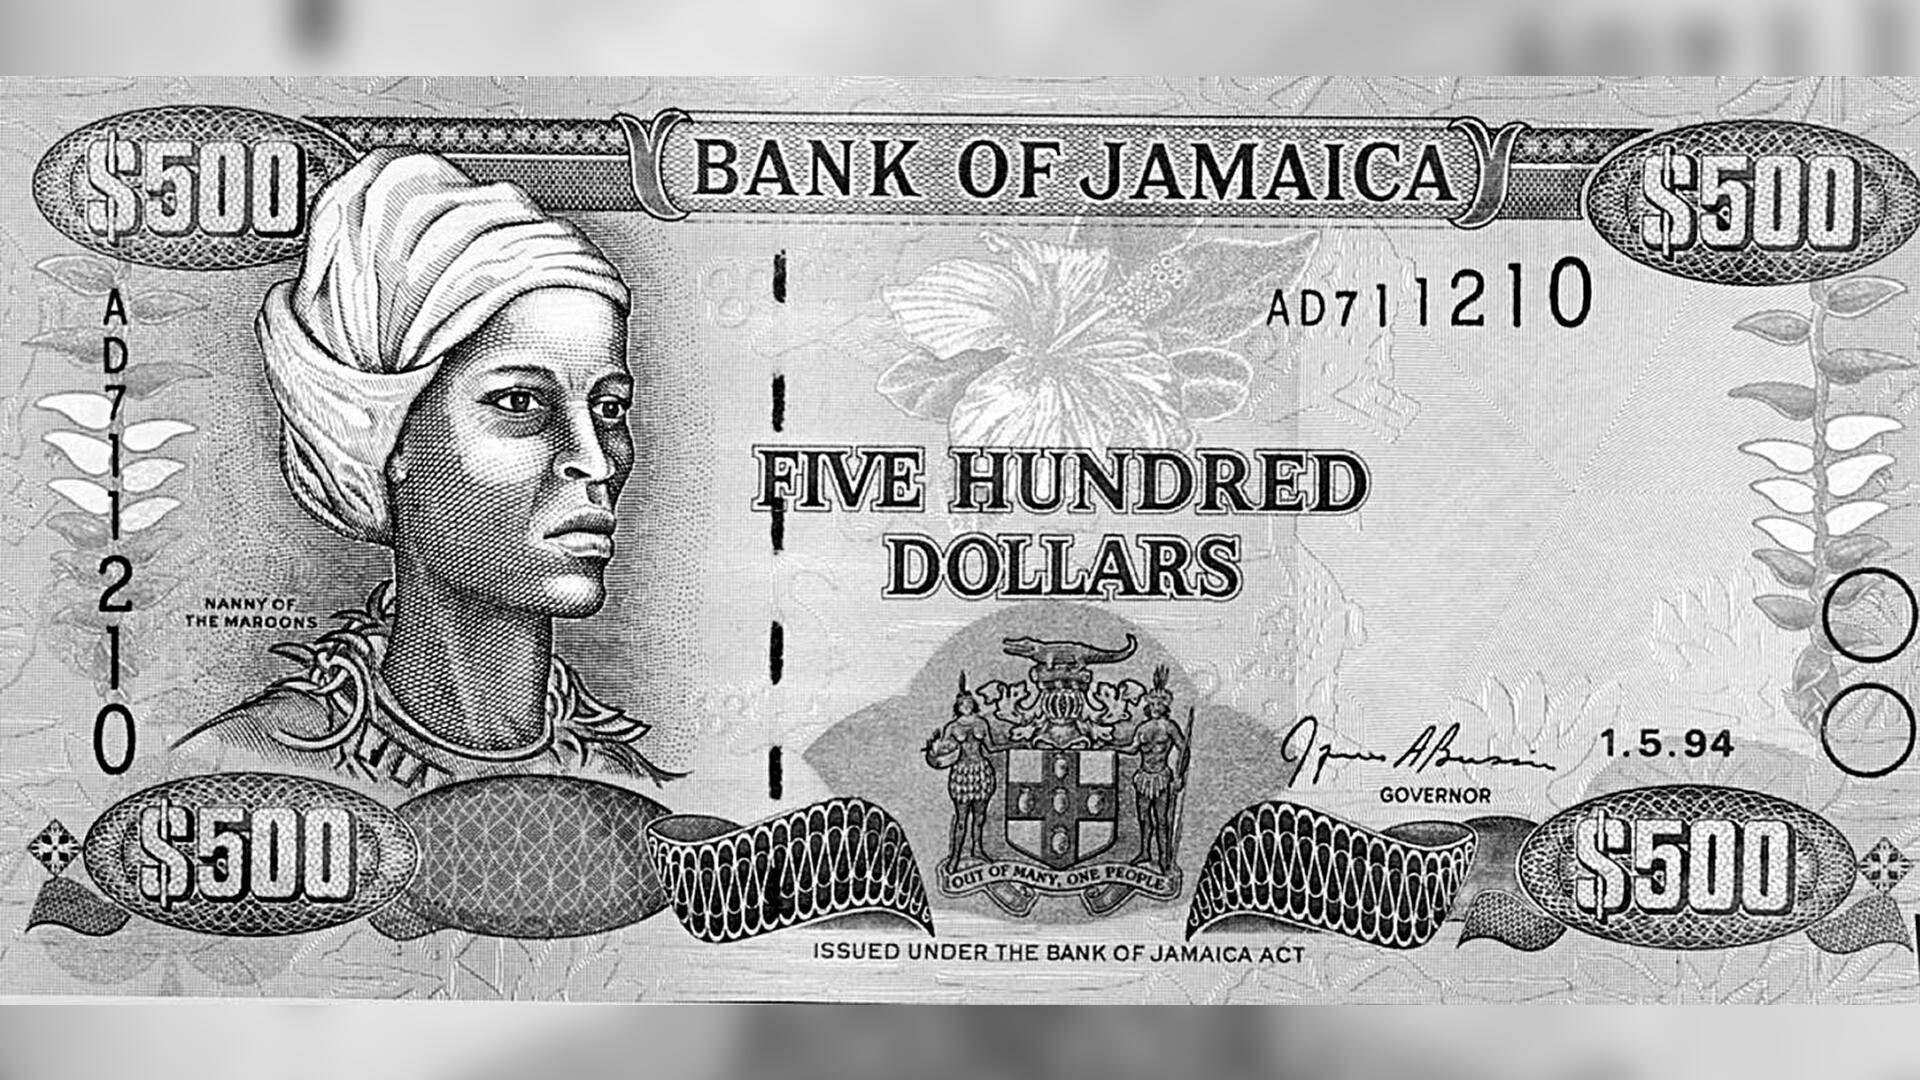 Un billet de 500 dollars jamaïcains à l'effigie de Nanny des Marrons.